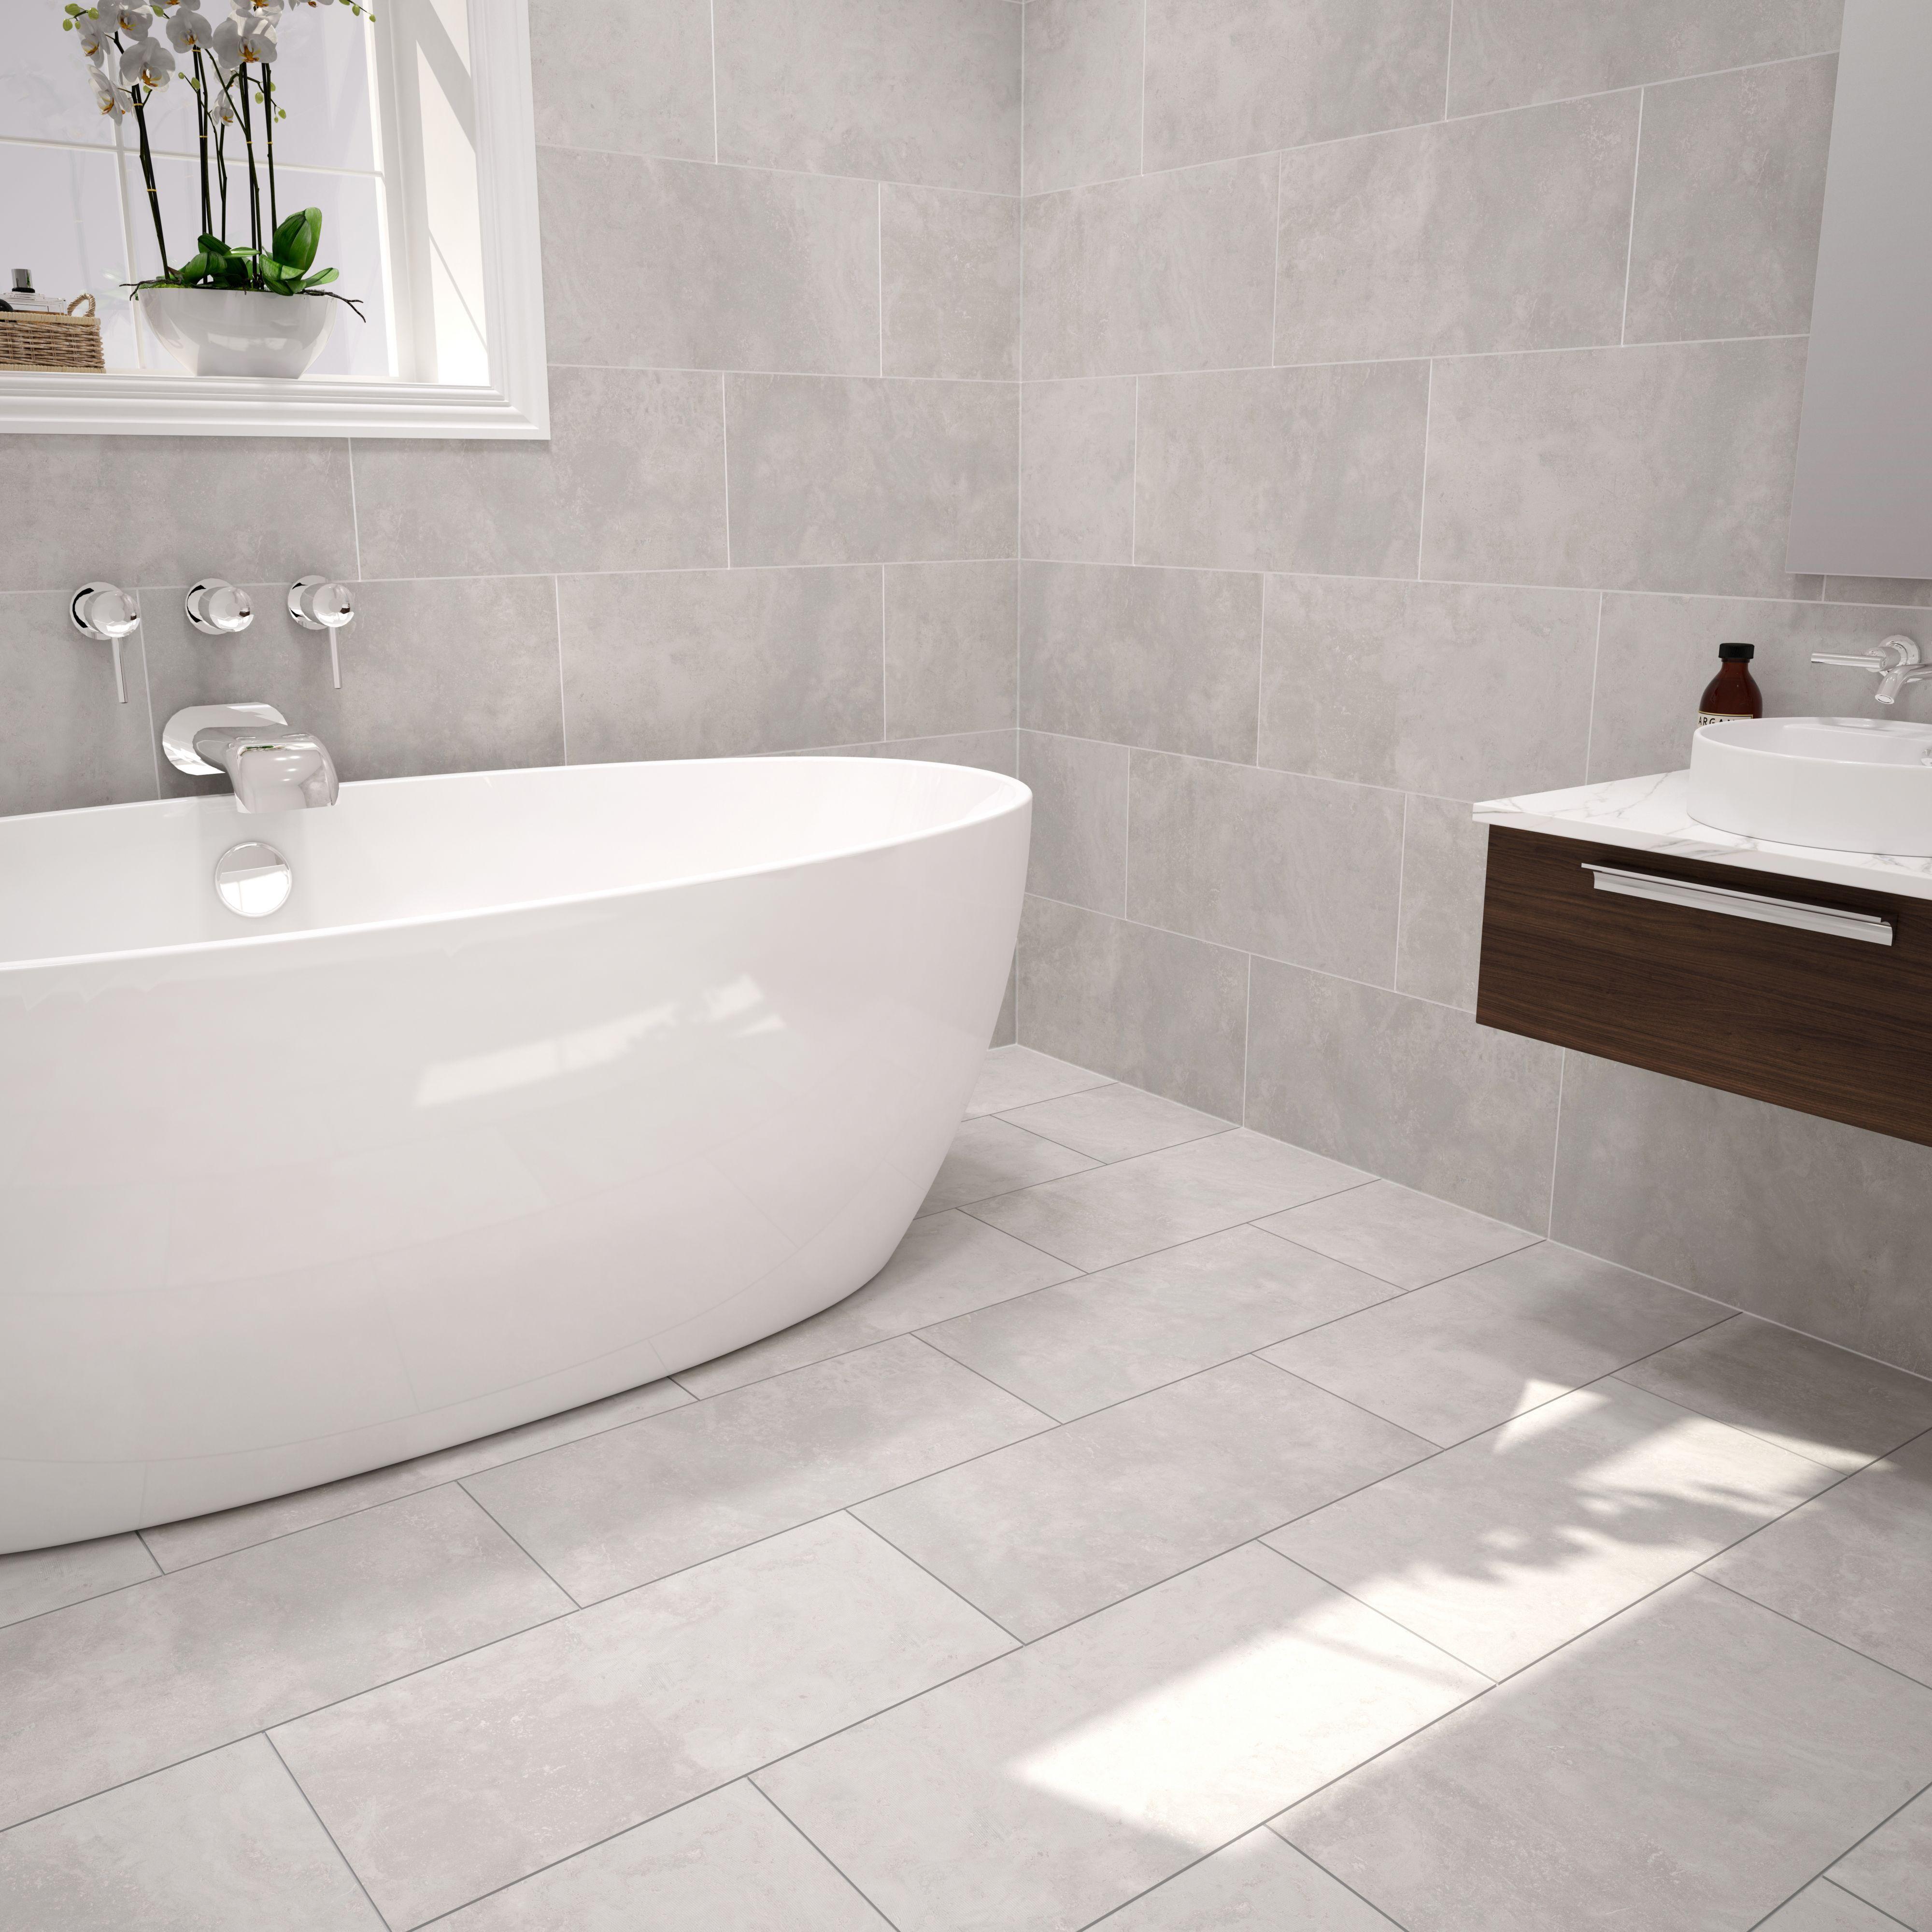 Urban Cement Grey Ceramic Wall & Floor Tile, Pack of 5, (L